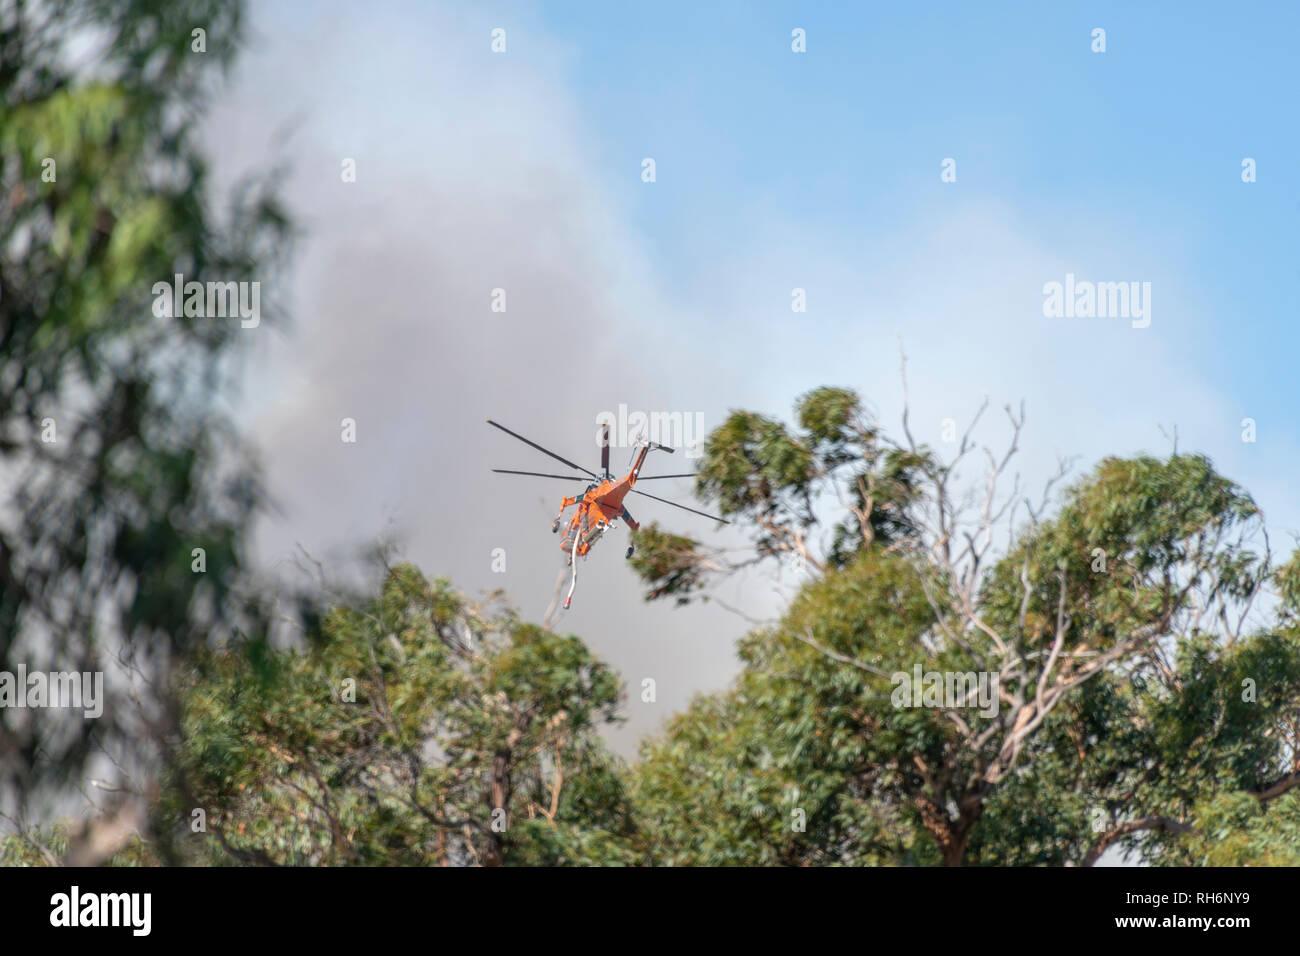 Grantville, Victoria, Australie. 06Th Feb 2019. L'Grantville G'S . Grantville Victoria Australie sur le Gran 01.02.2019 Crédit: Eric Eichin/Alamy Live News Photo Stock